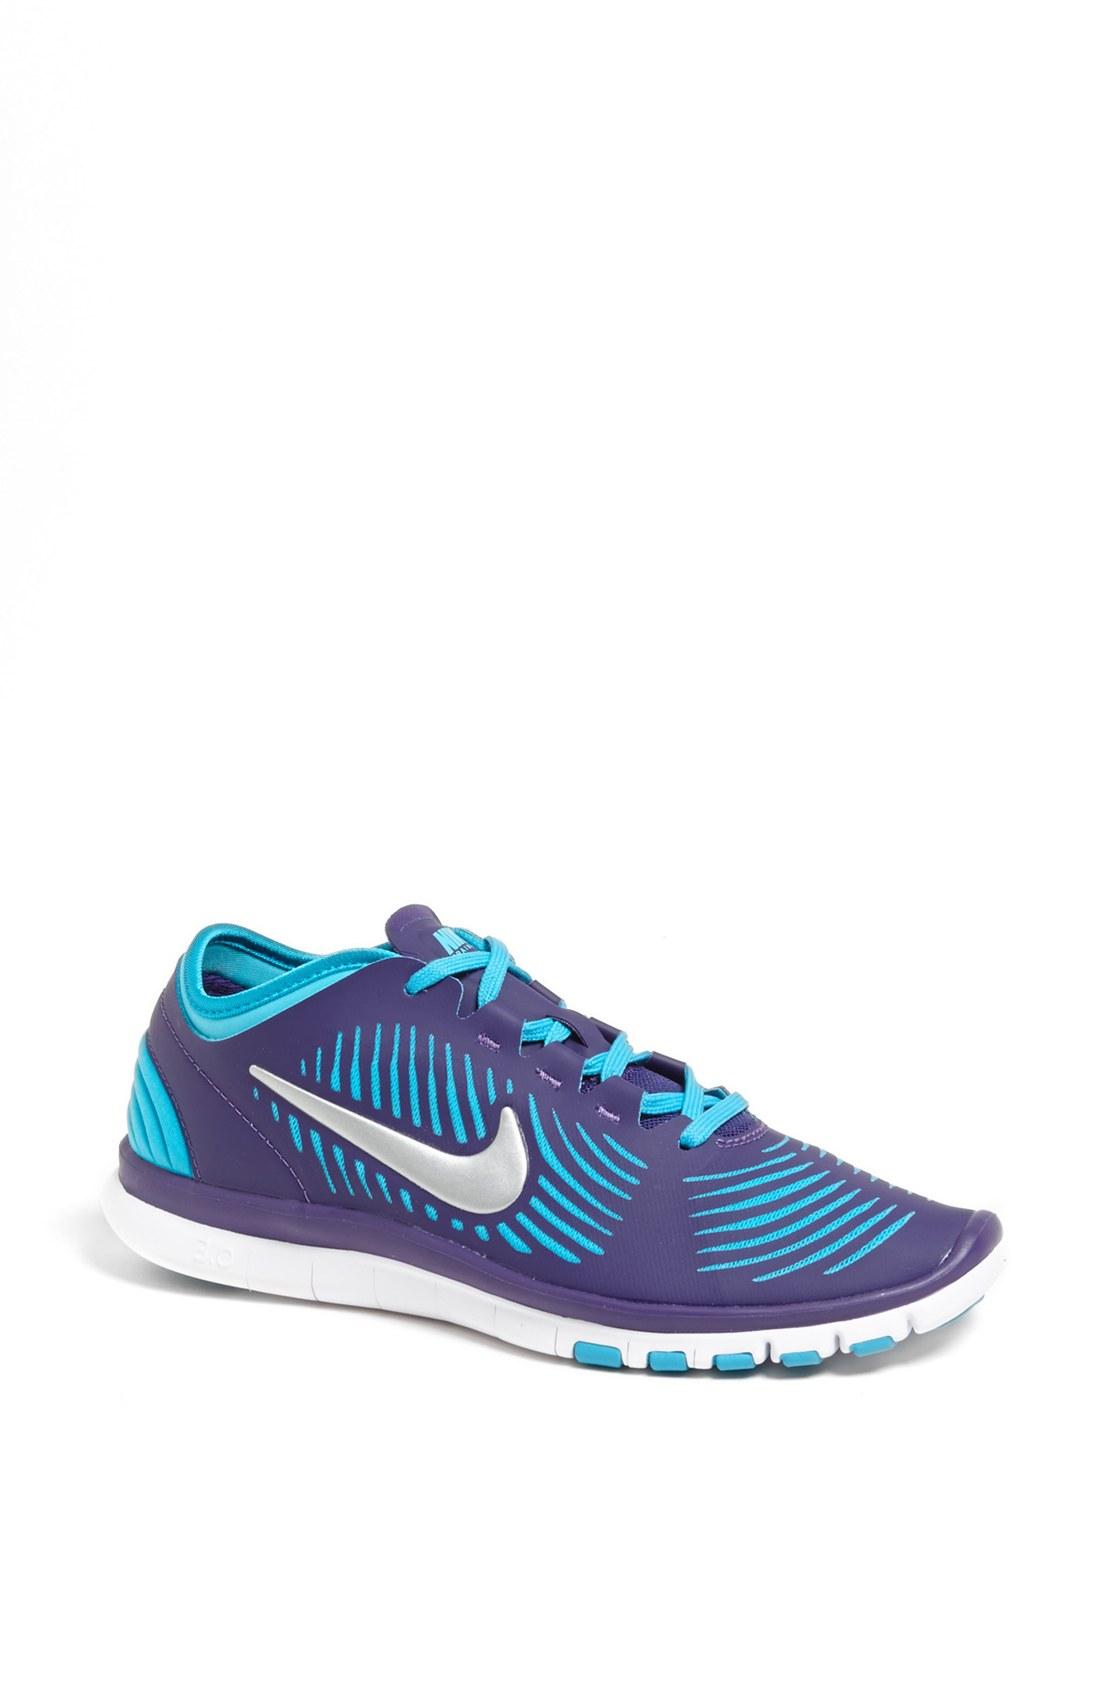 Nike Free Balanza Training Shoe in Blue (Purple/ Gamma ...